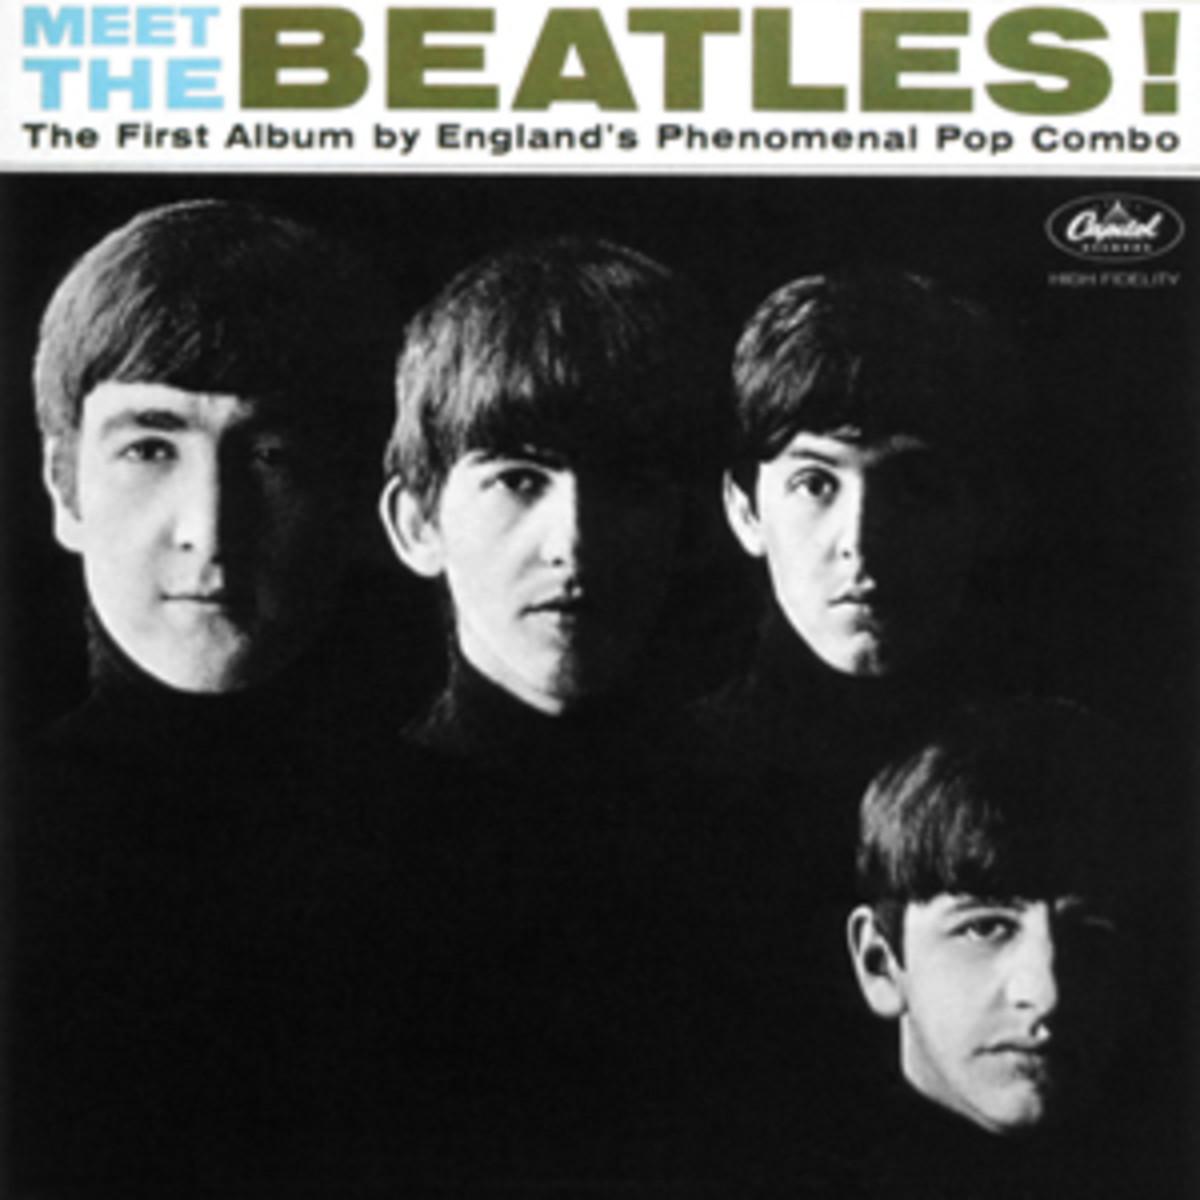 The Beatles Meet The Beatles